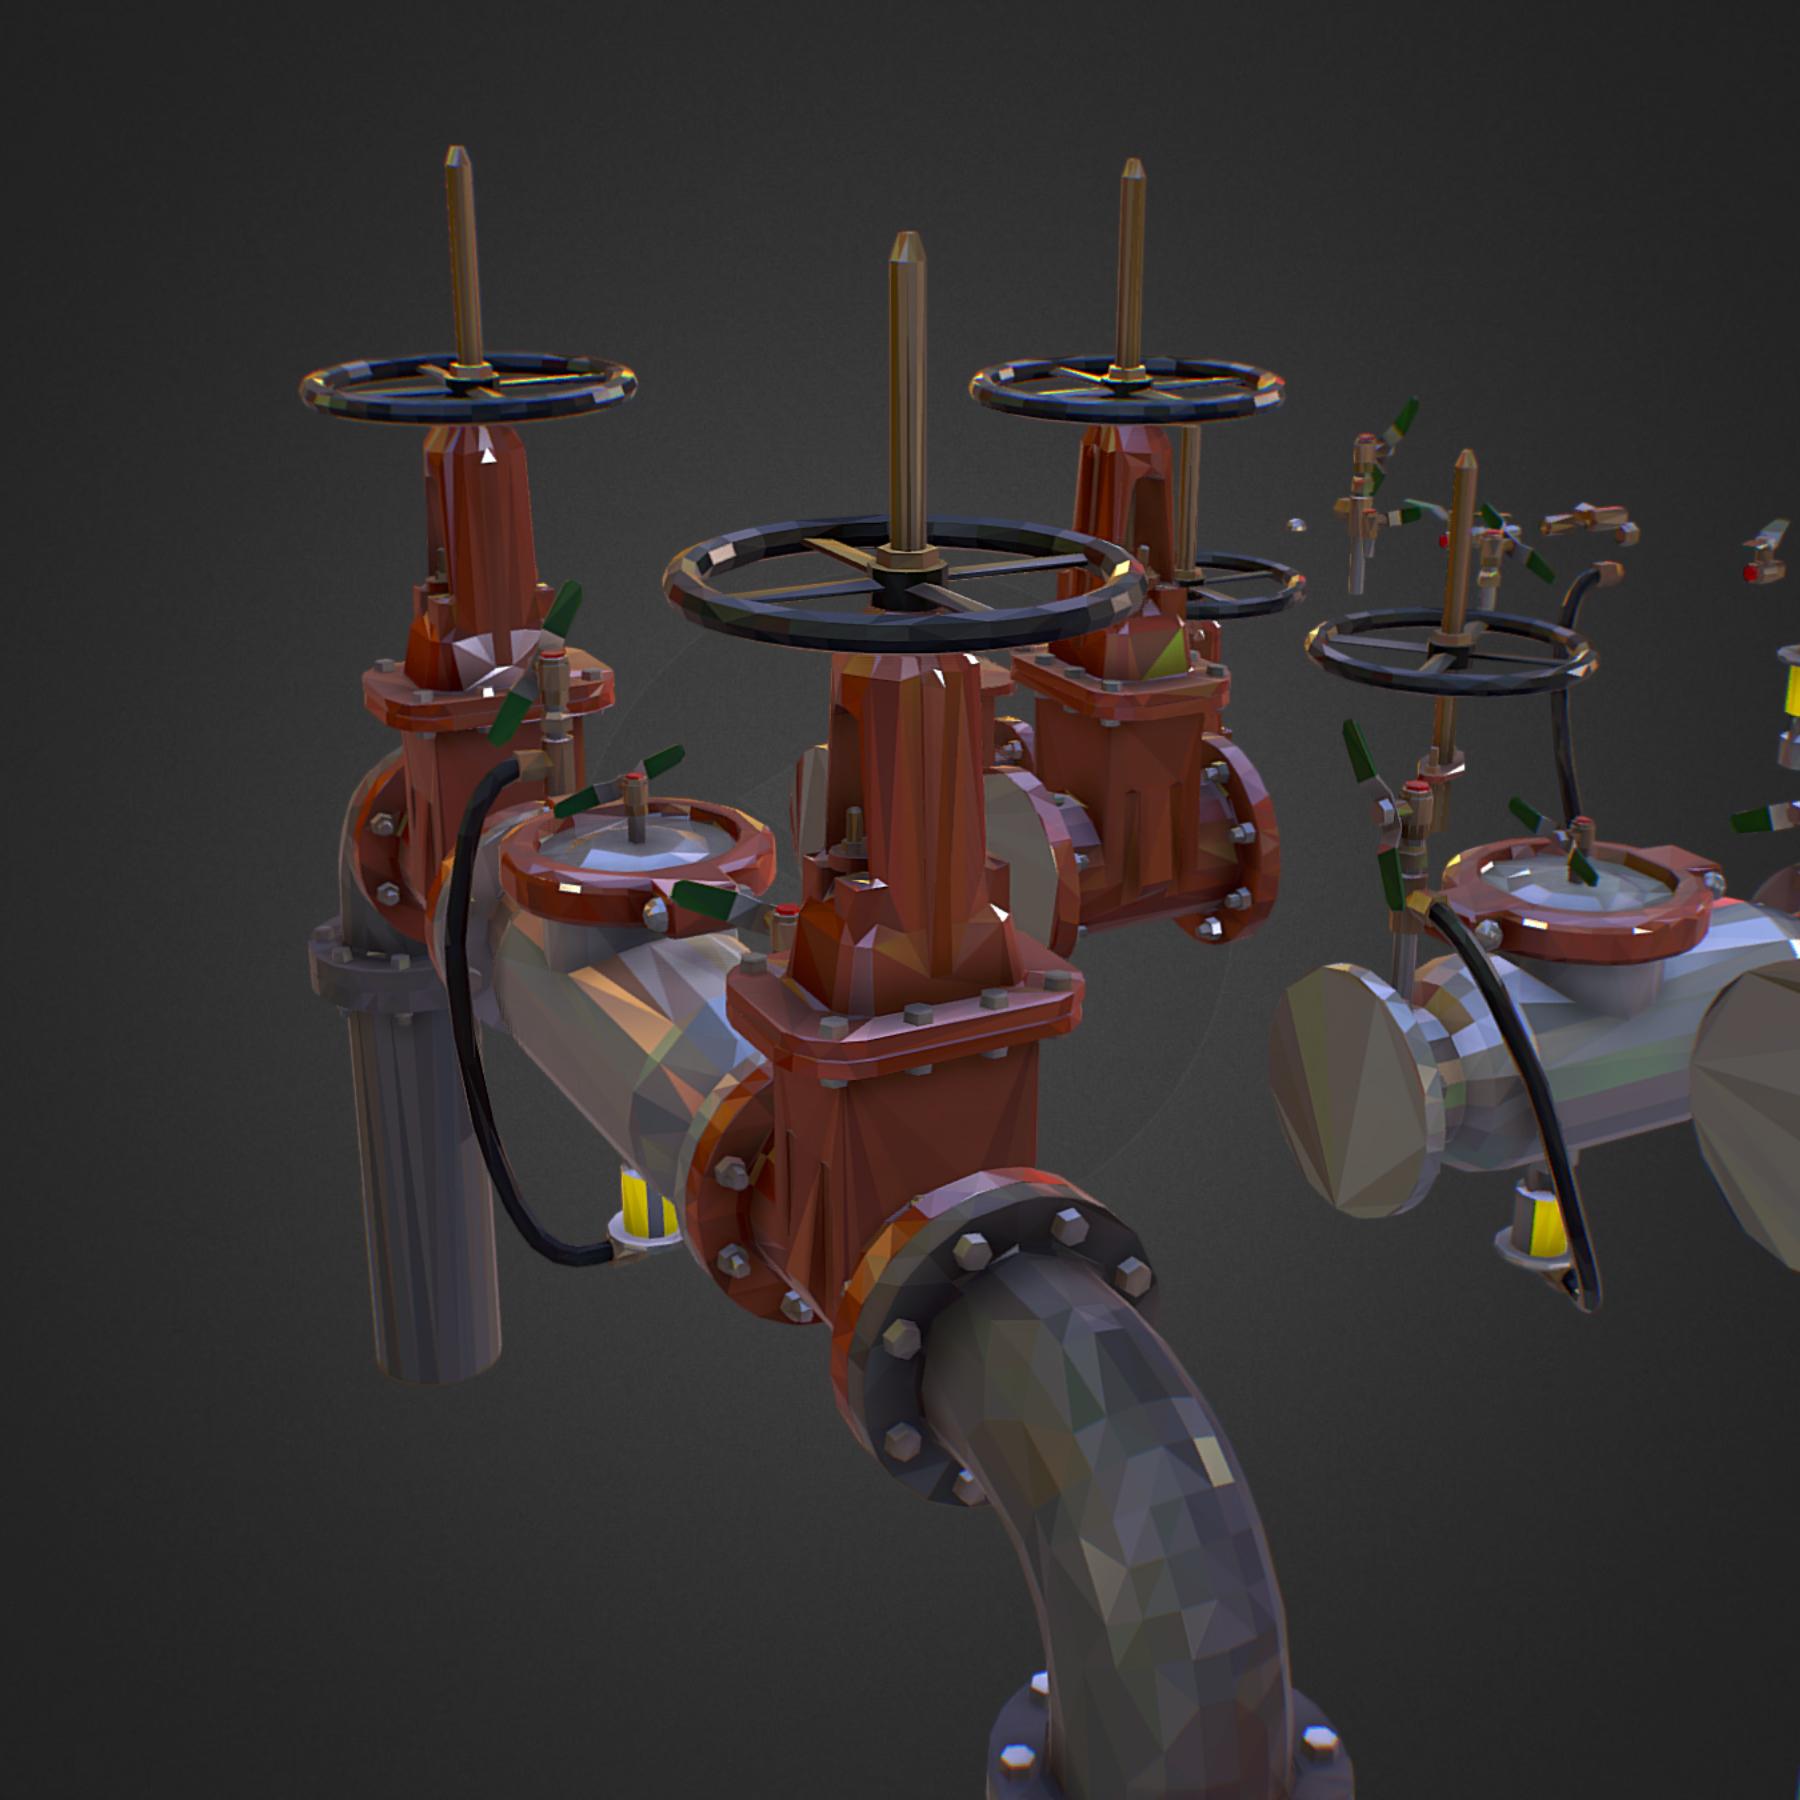 Low Poly ART Backflow Water Pipe Constructor 3d model max 3ds max plugin fbx ma mb tga targa icb vda vst pix obj 272561